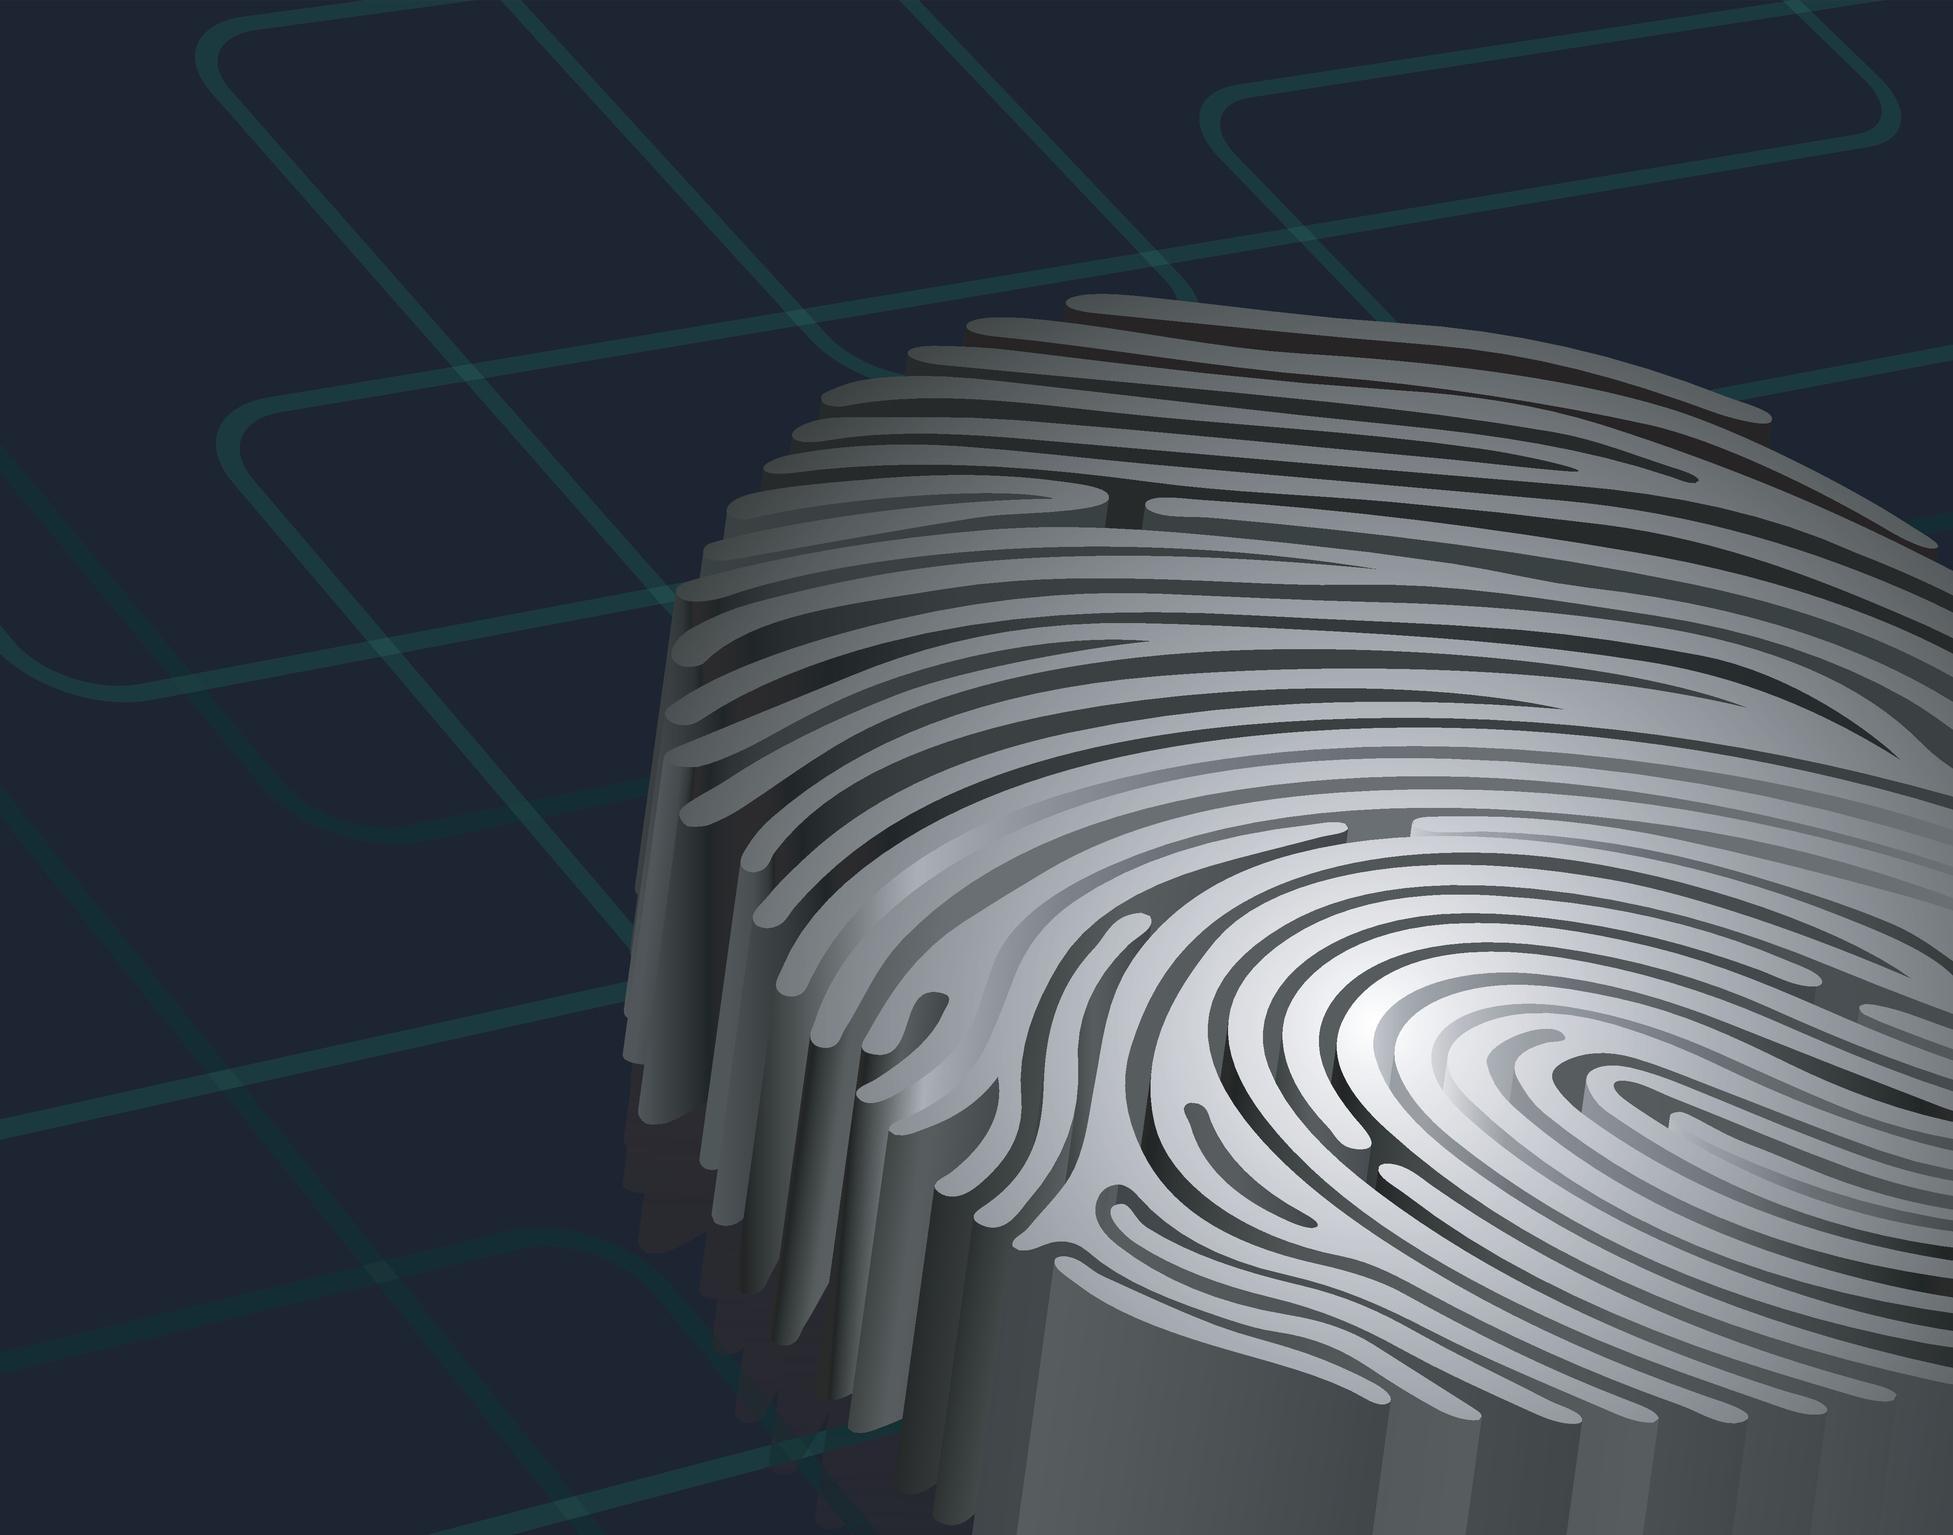 New OPM background check agency will inherit huge backlog - FedScoop